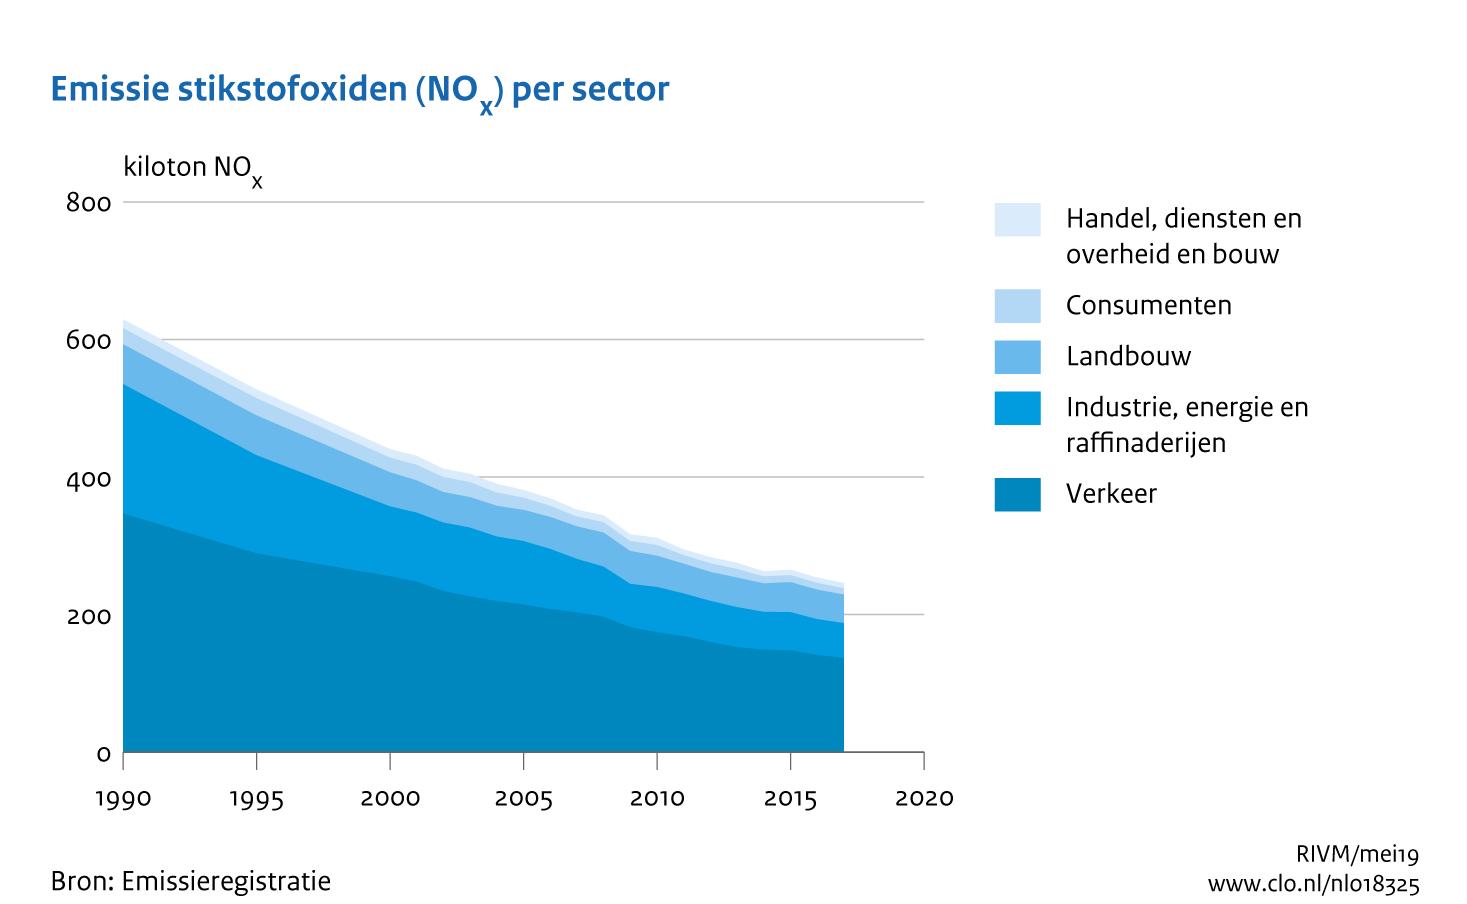 https://www.rivm.nl/sites/default/files/2019-09/grafiek_emissie_stikstofdioxide_per_sector.png